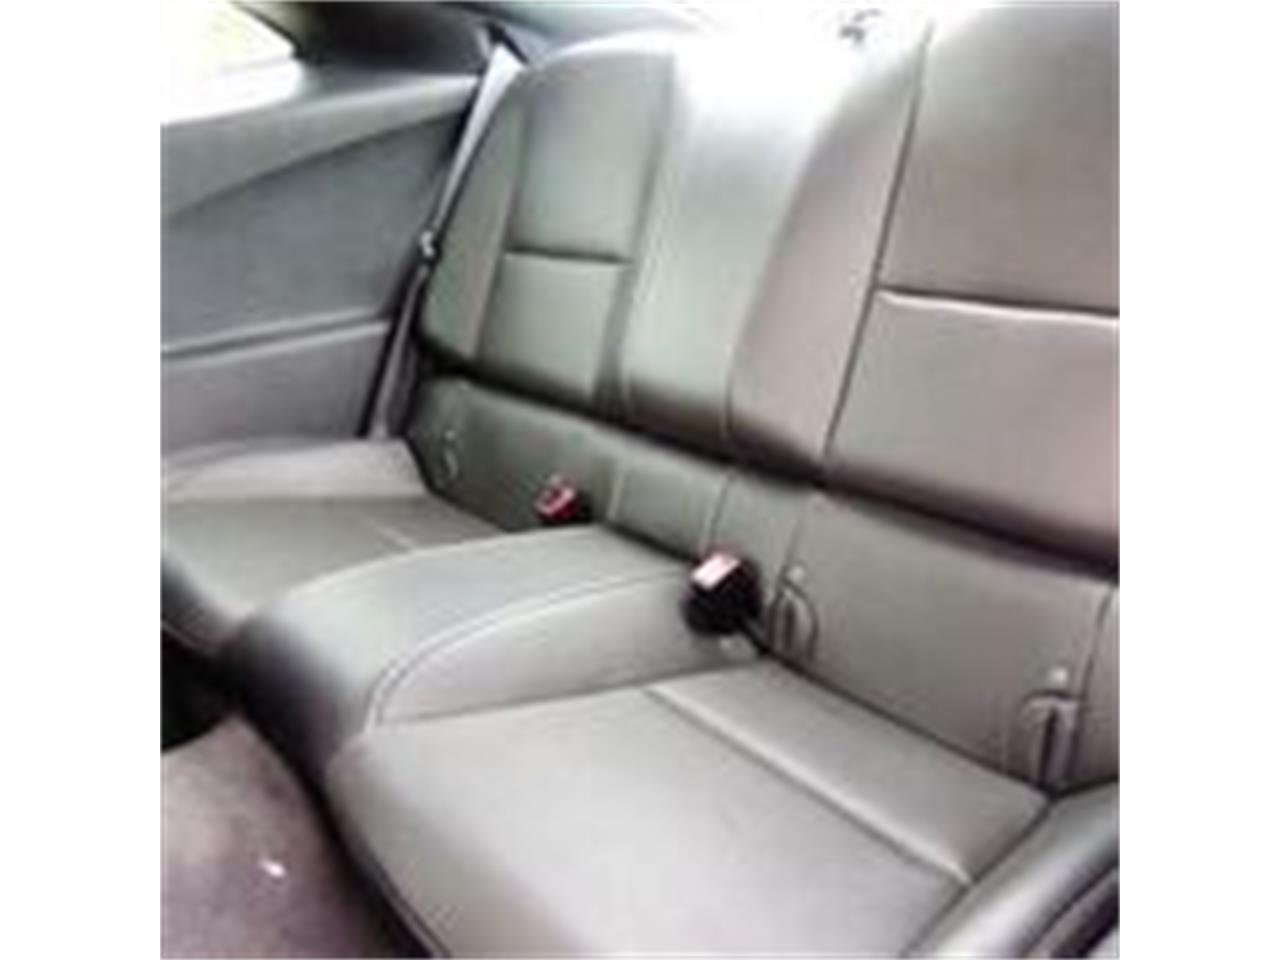 2010 Chevrolet Camaro (CC-1206665) for sale in Boca Raton, Florida